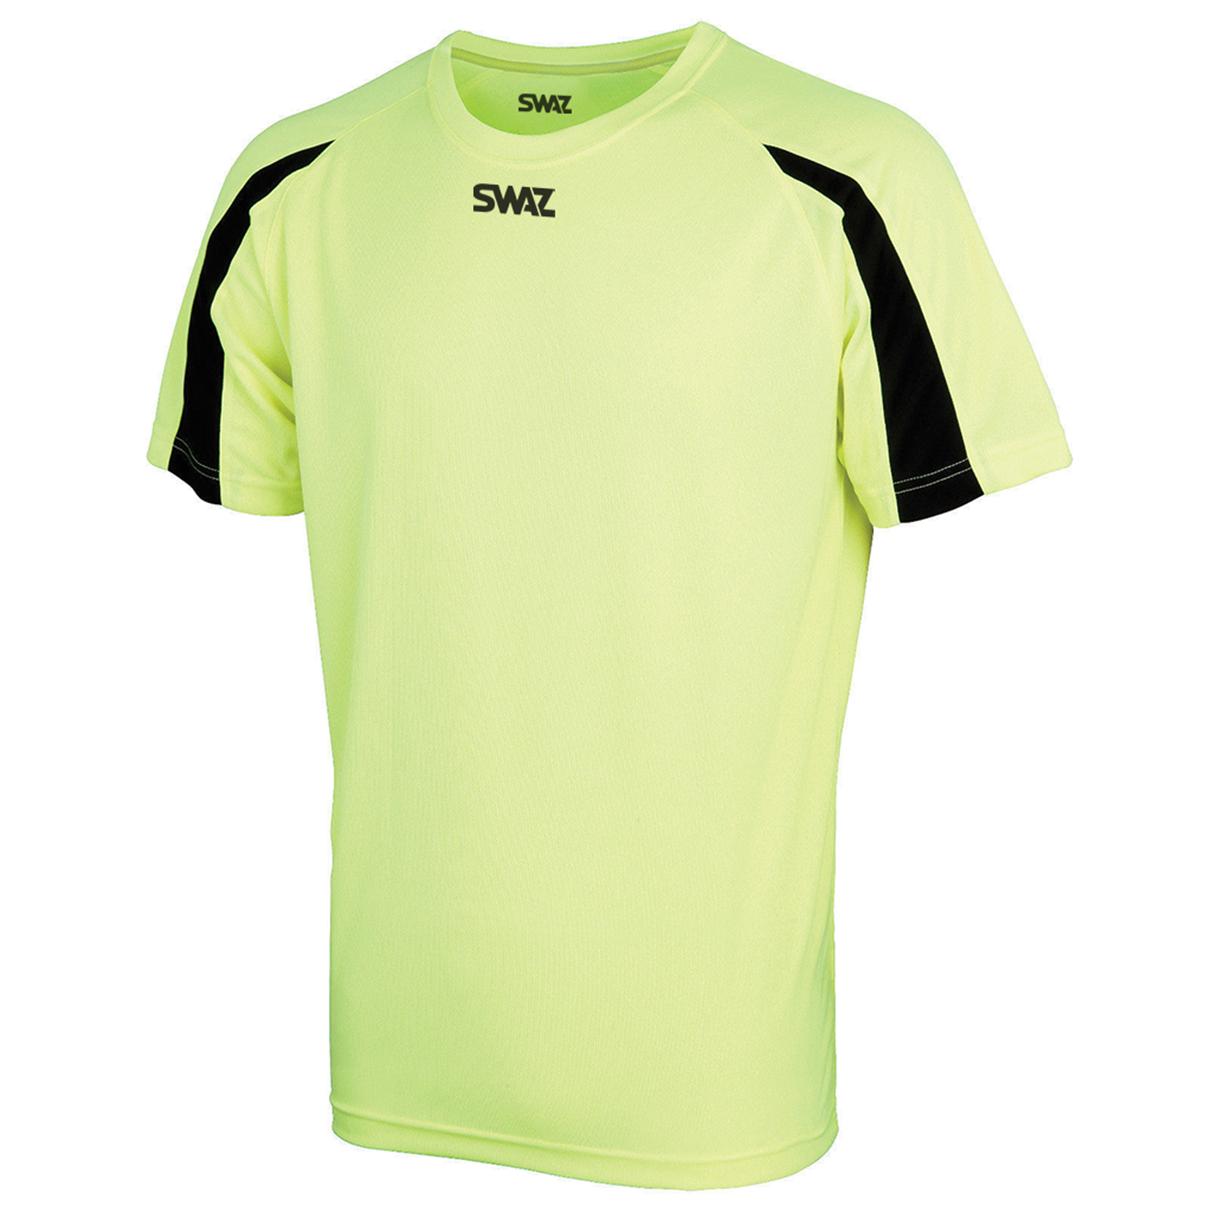 SWAZ Premier Training T-Shirt Electric – Yellow/Black